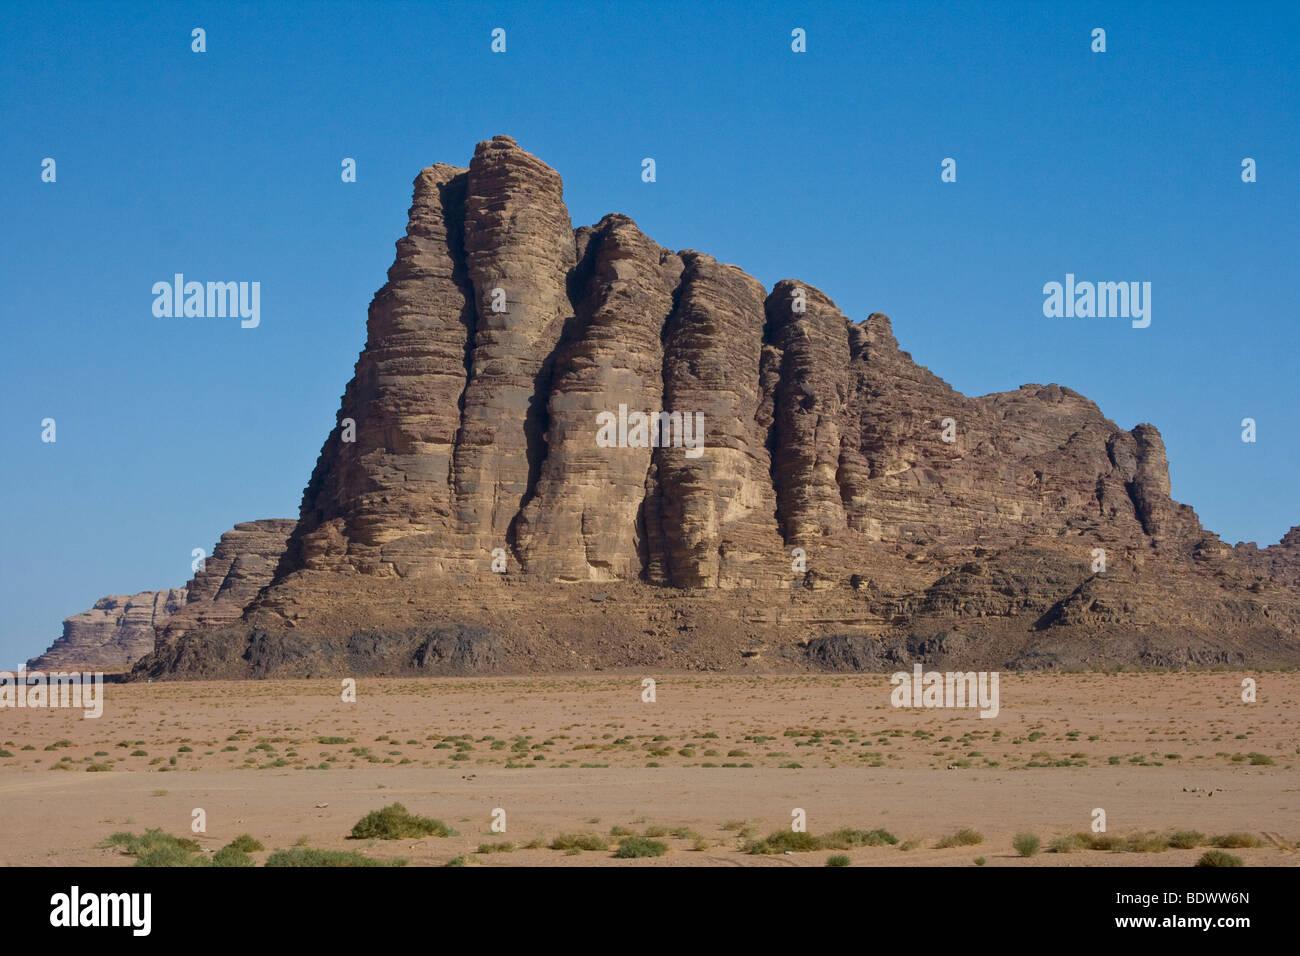 Seven Pillars of Wisdom Rock Formation in Wadi Rum Jordan - Stock Image